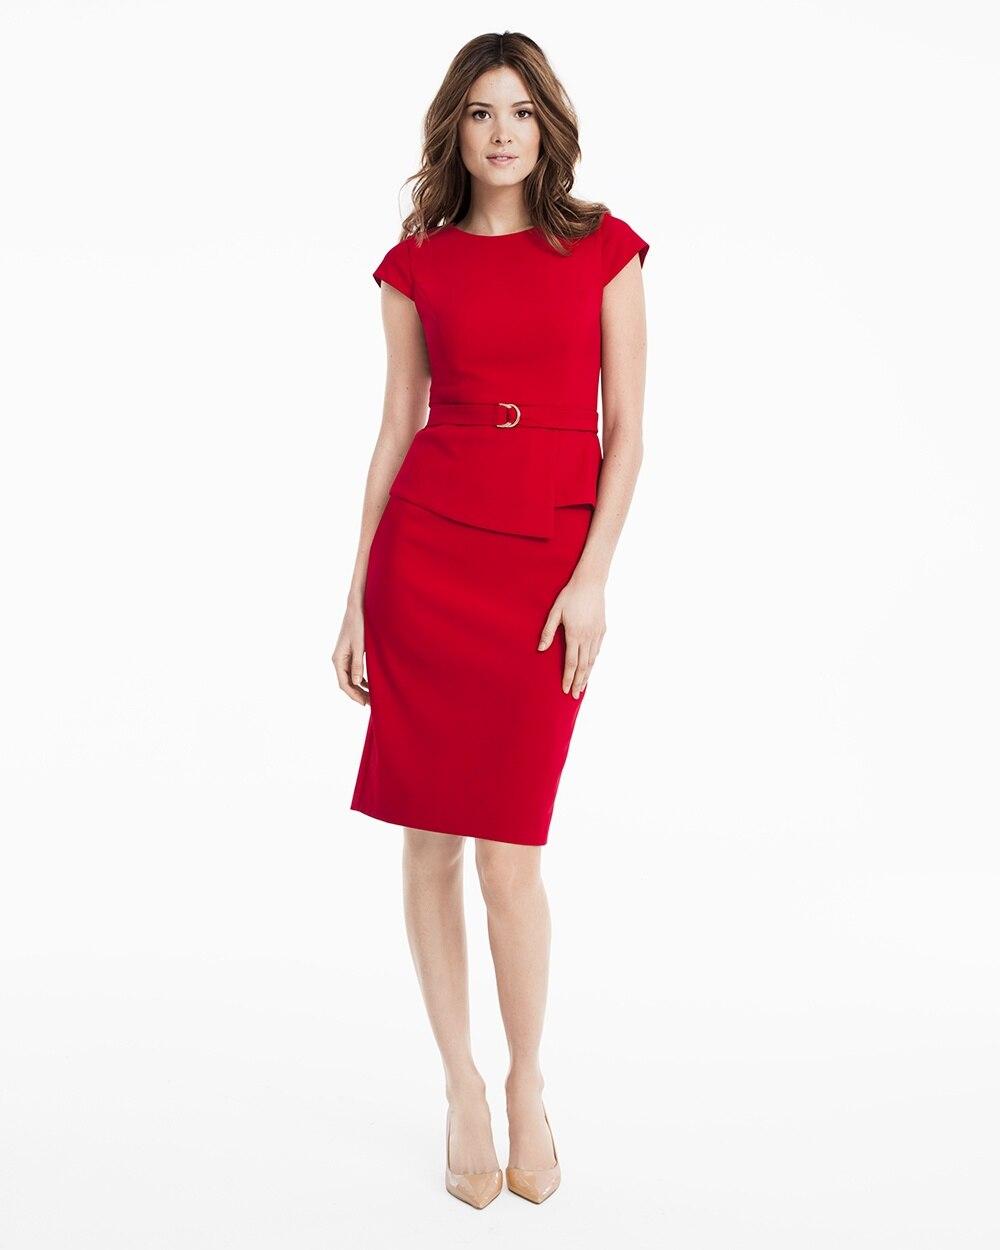 Cap Sleeve Peplum Sheath Dress White House Black Market